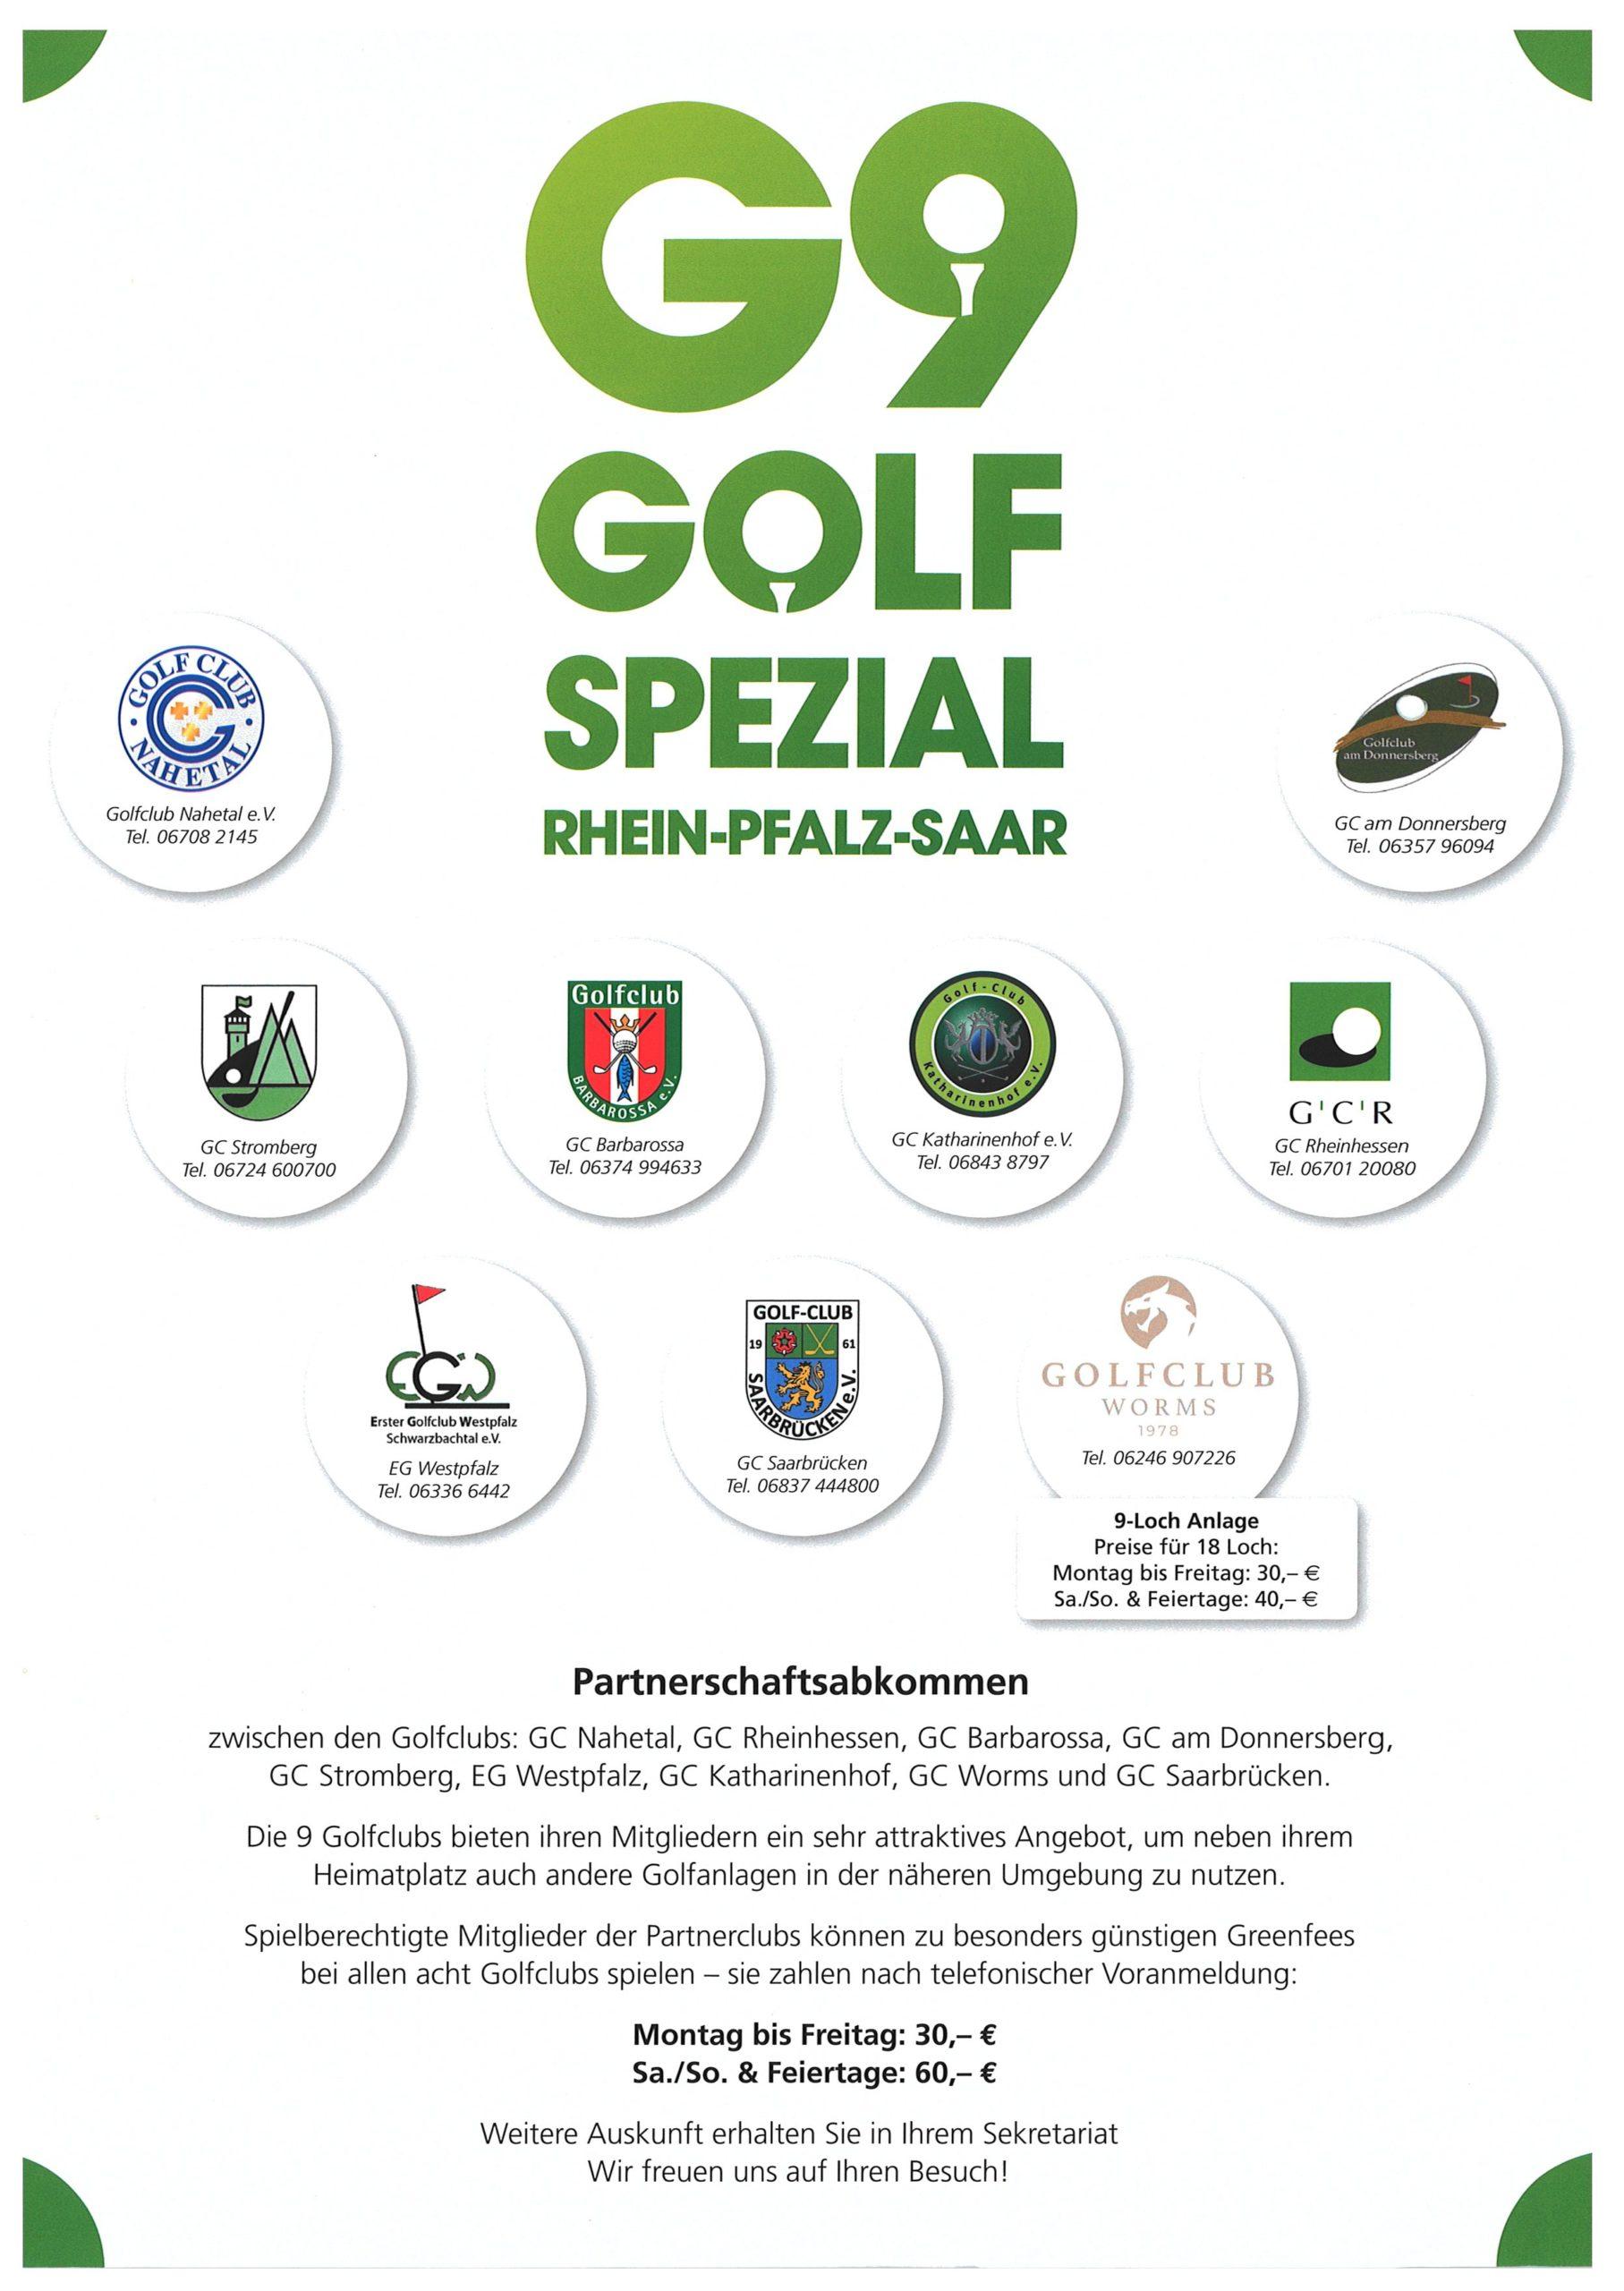 Golfclub Rheinhessen: G9 Golf Spezial Partnerschaftsabkommen 2020